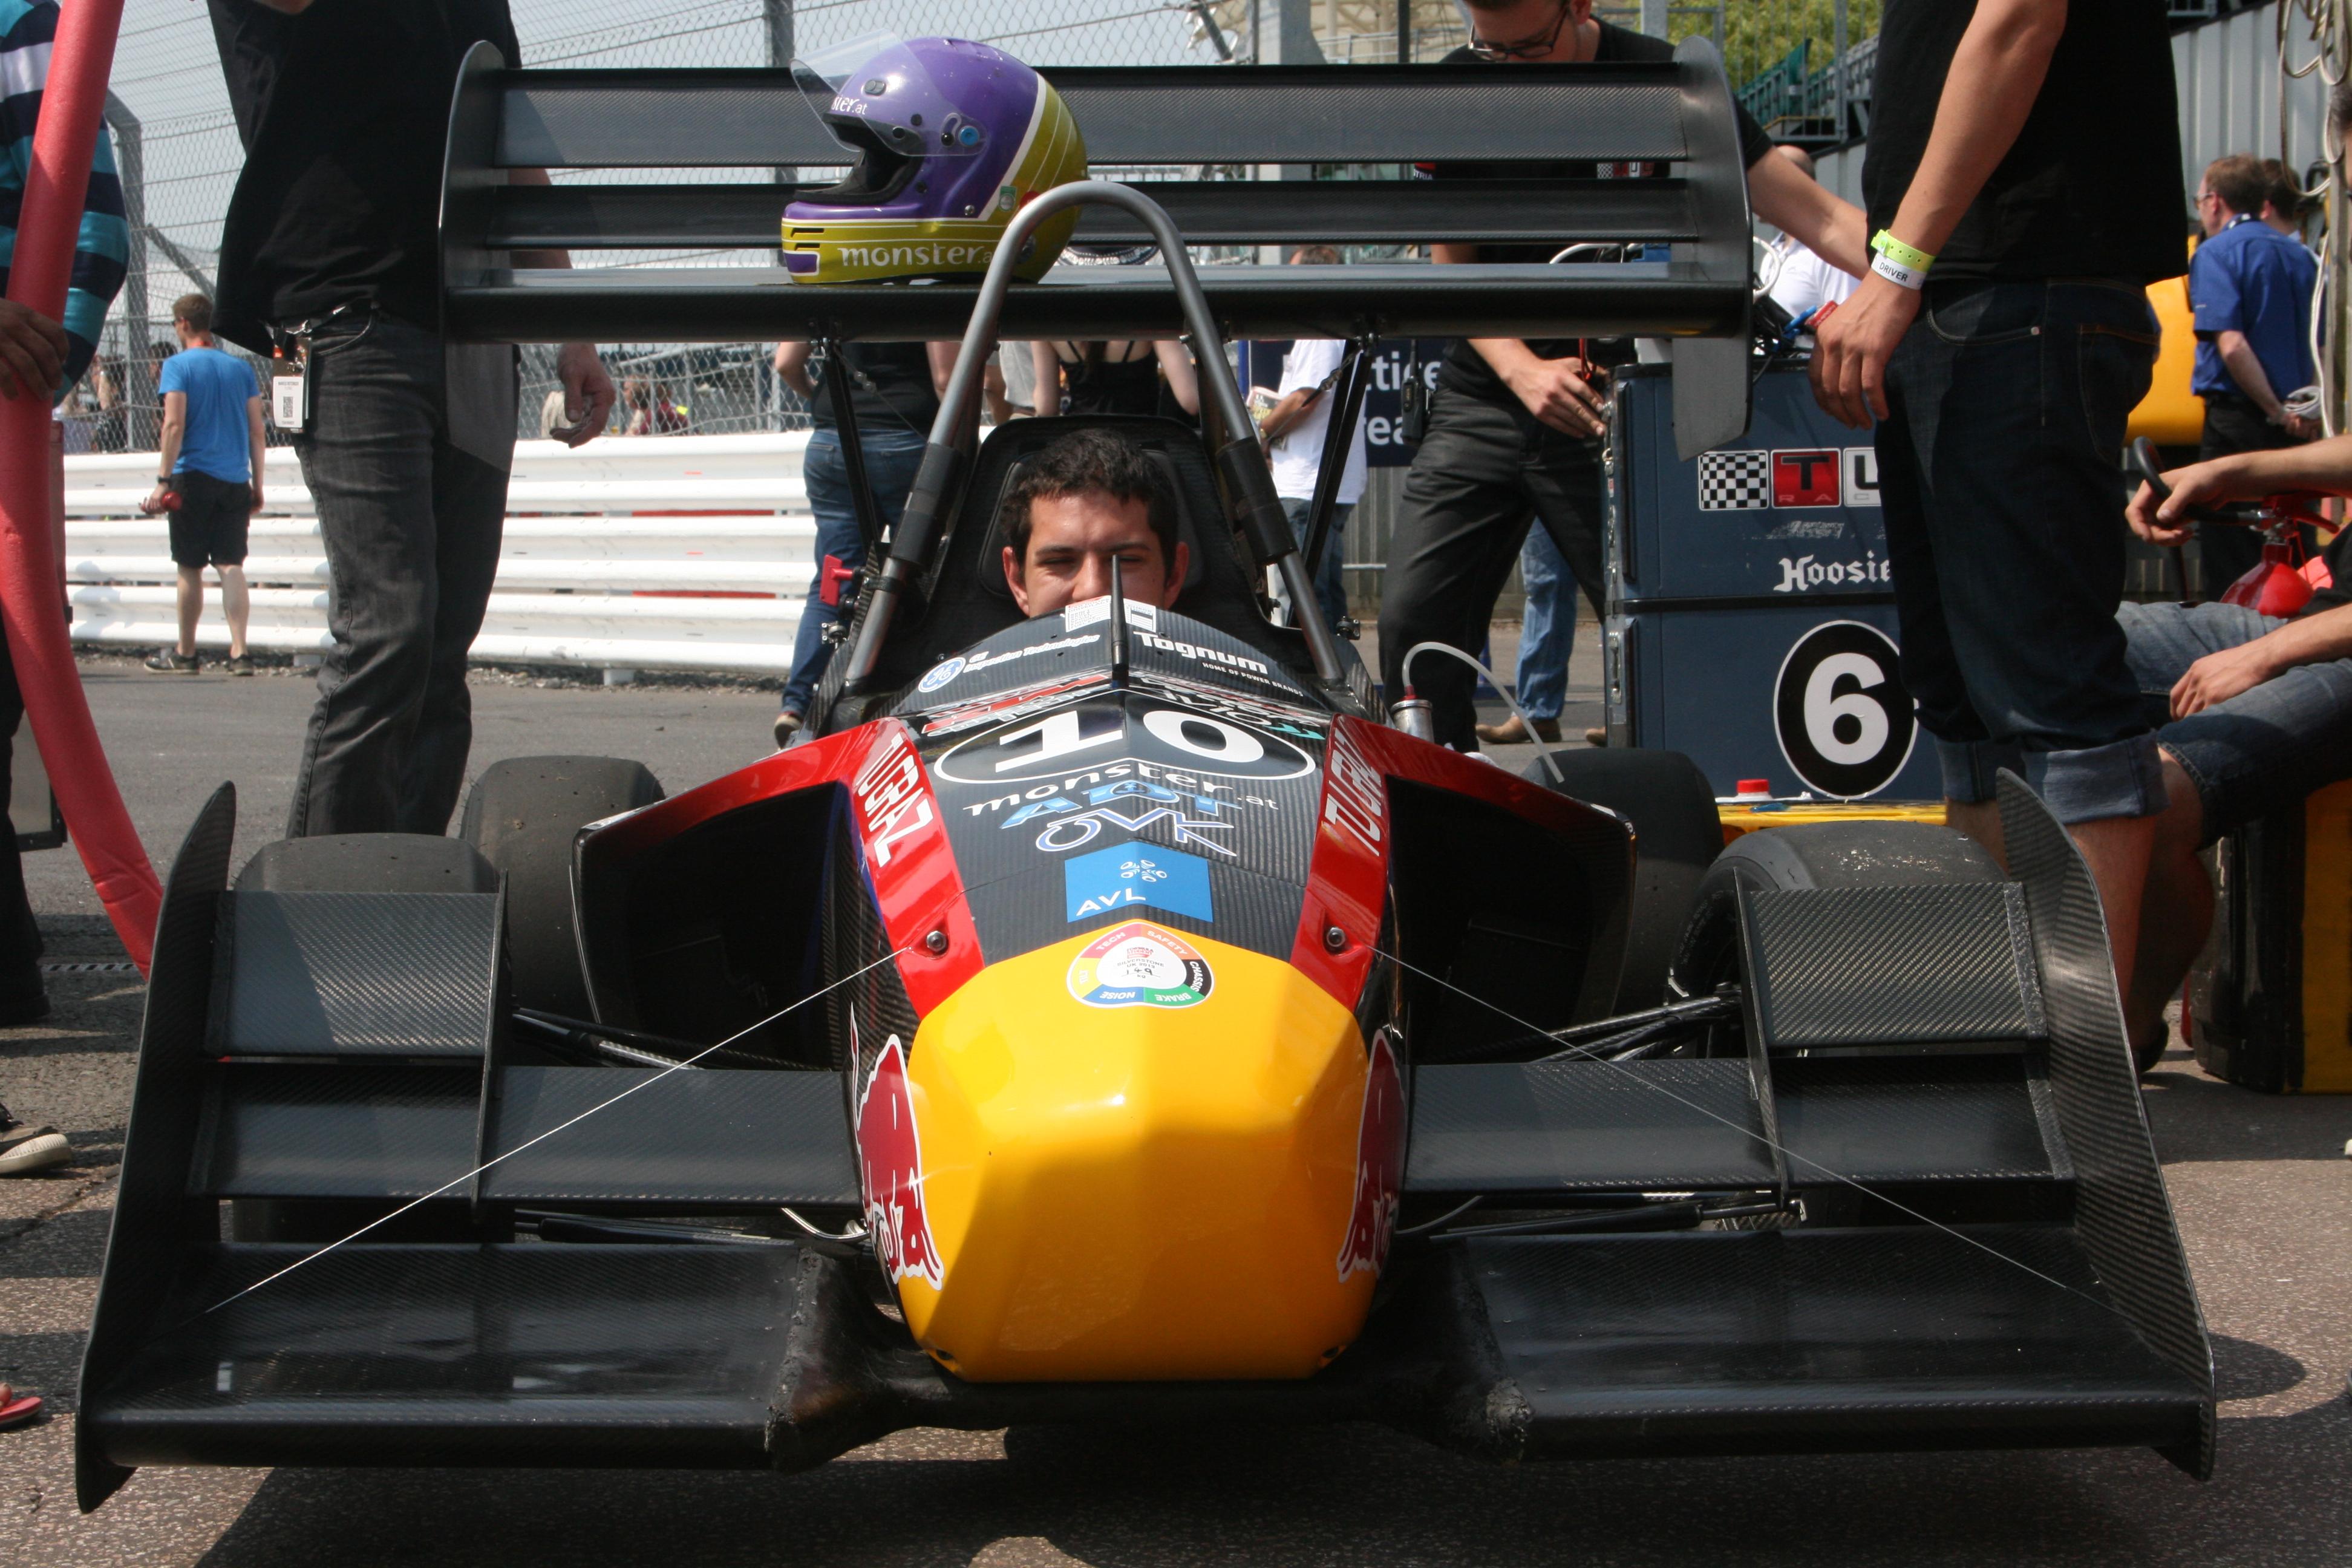 Formulastudent_proformance12